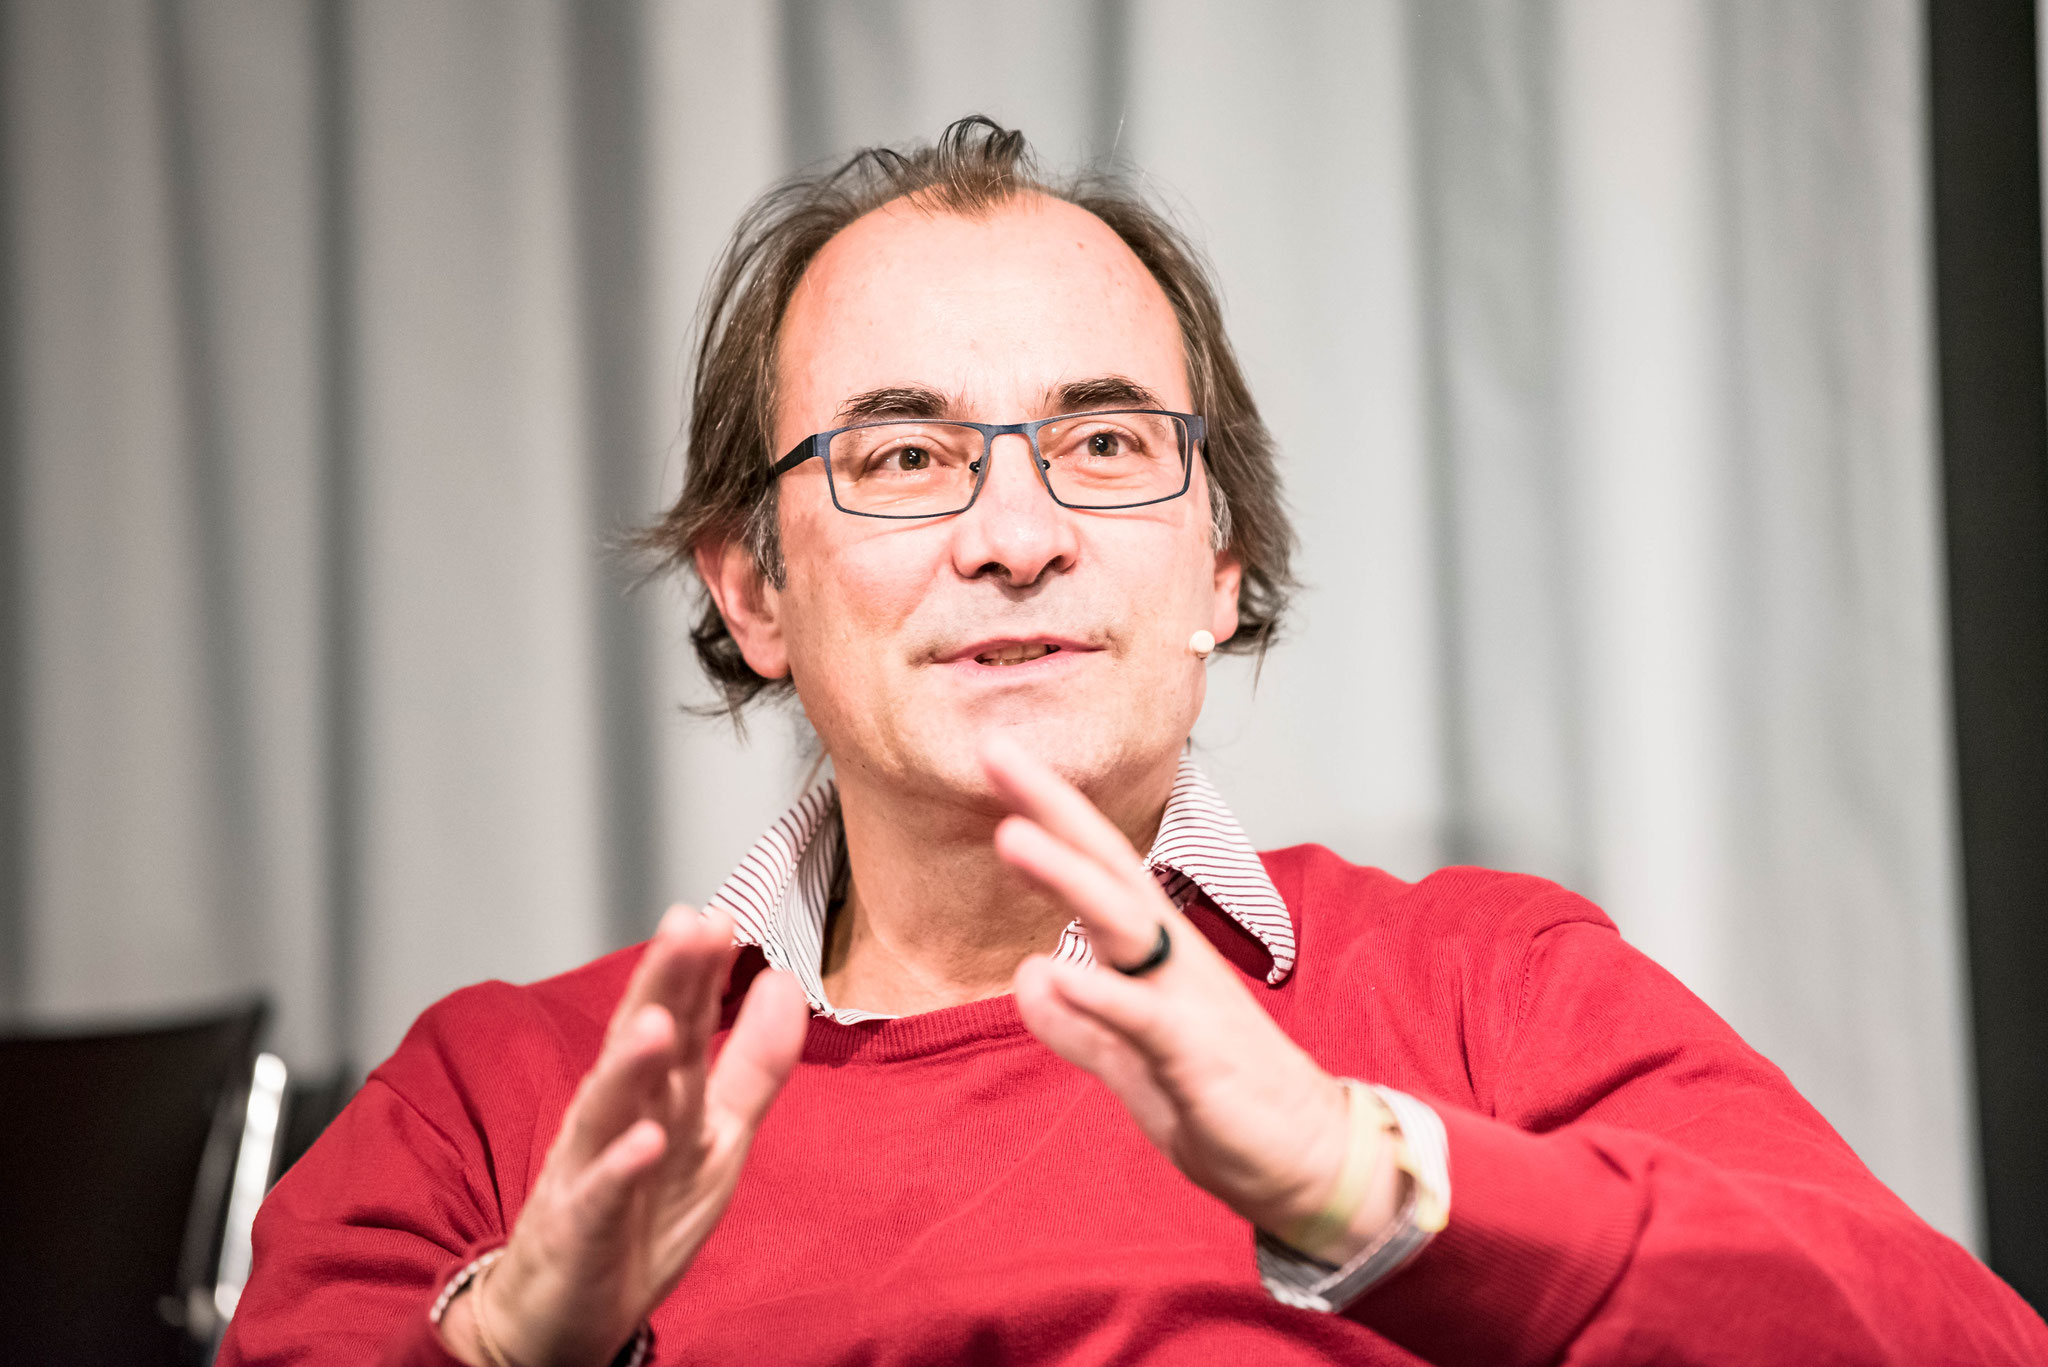 Andreas Nufer (Pfarrer Heiliggeistkirche Bern)